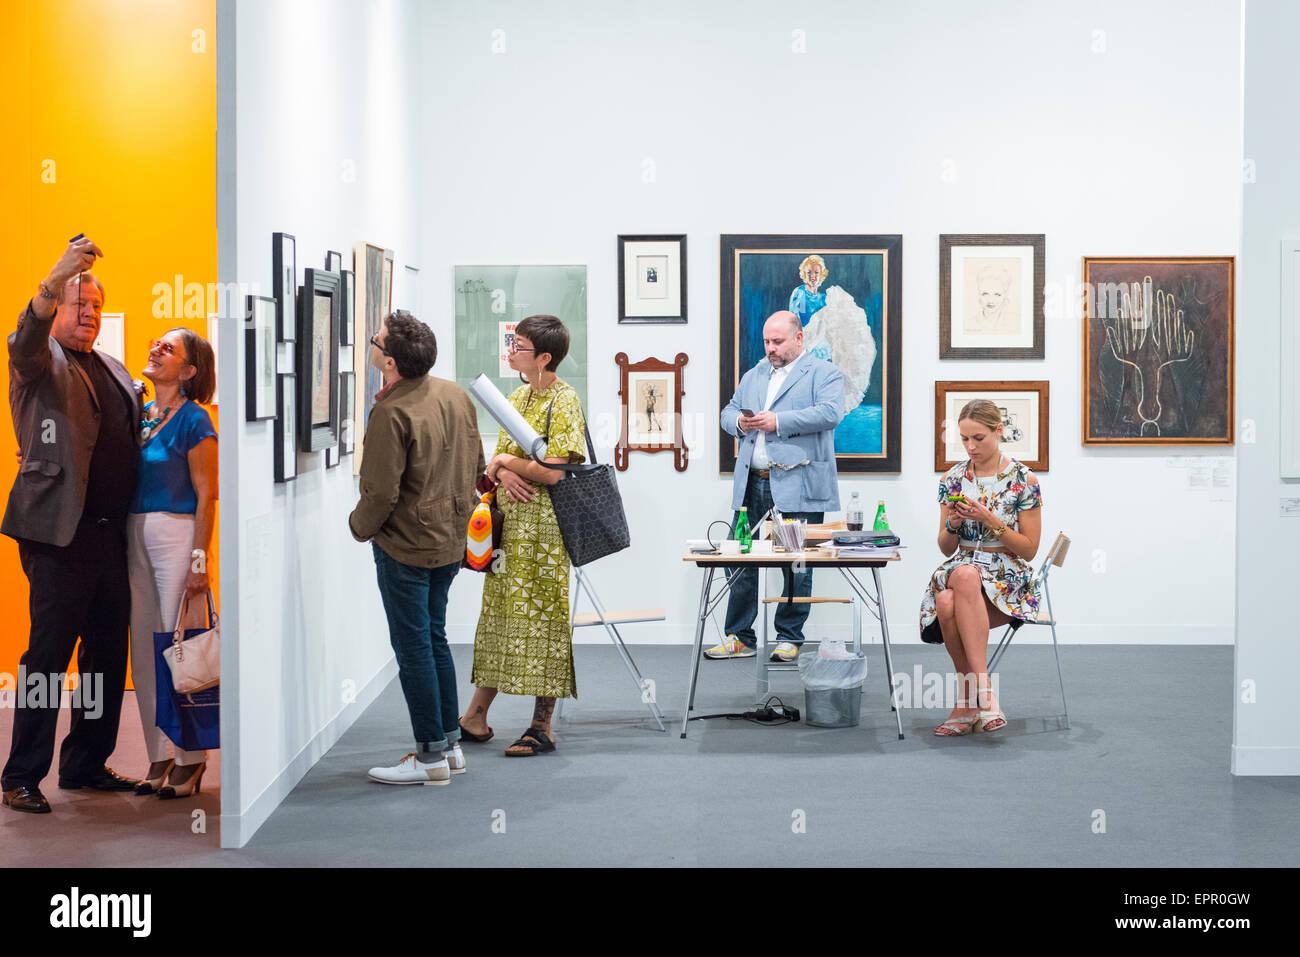 Art Basel Miami florida feria internacional de arte contemporáneo moderno exposiciones fotografías esculturas concesionarios stand visitantes invitados silla mesa Foto de stock